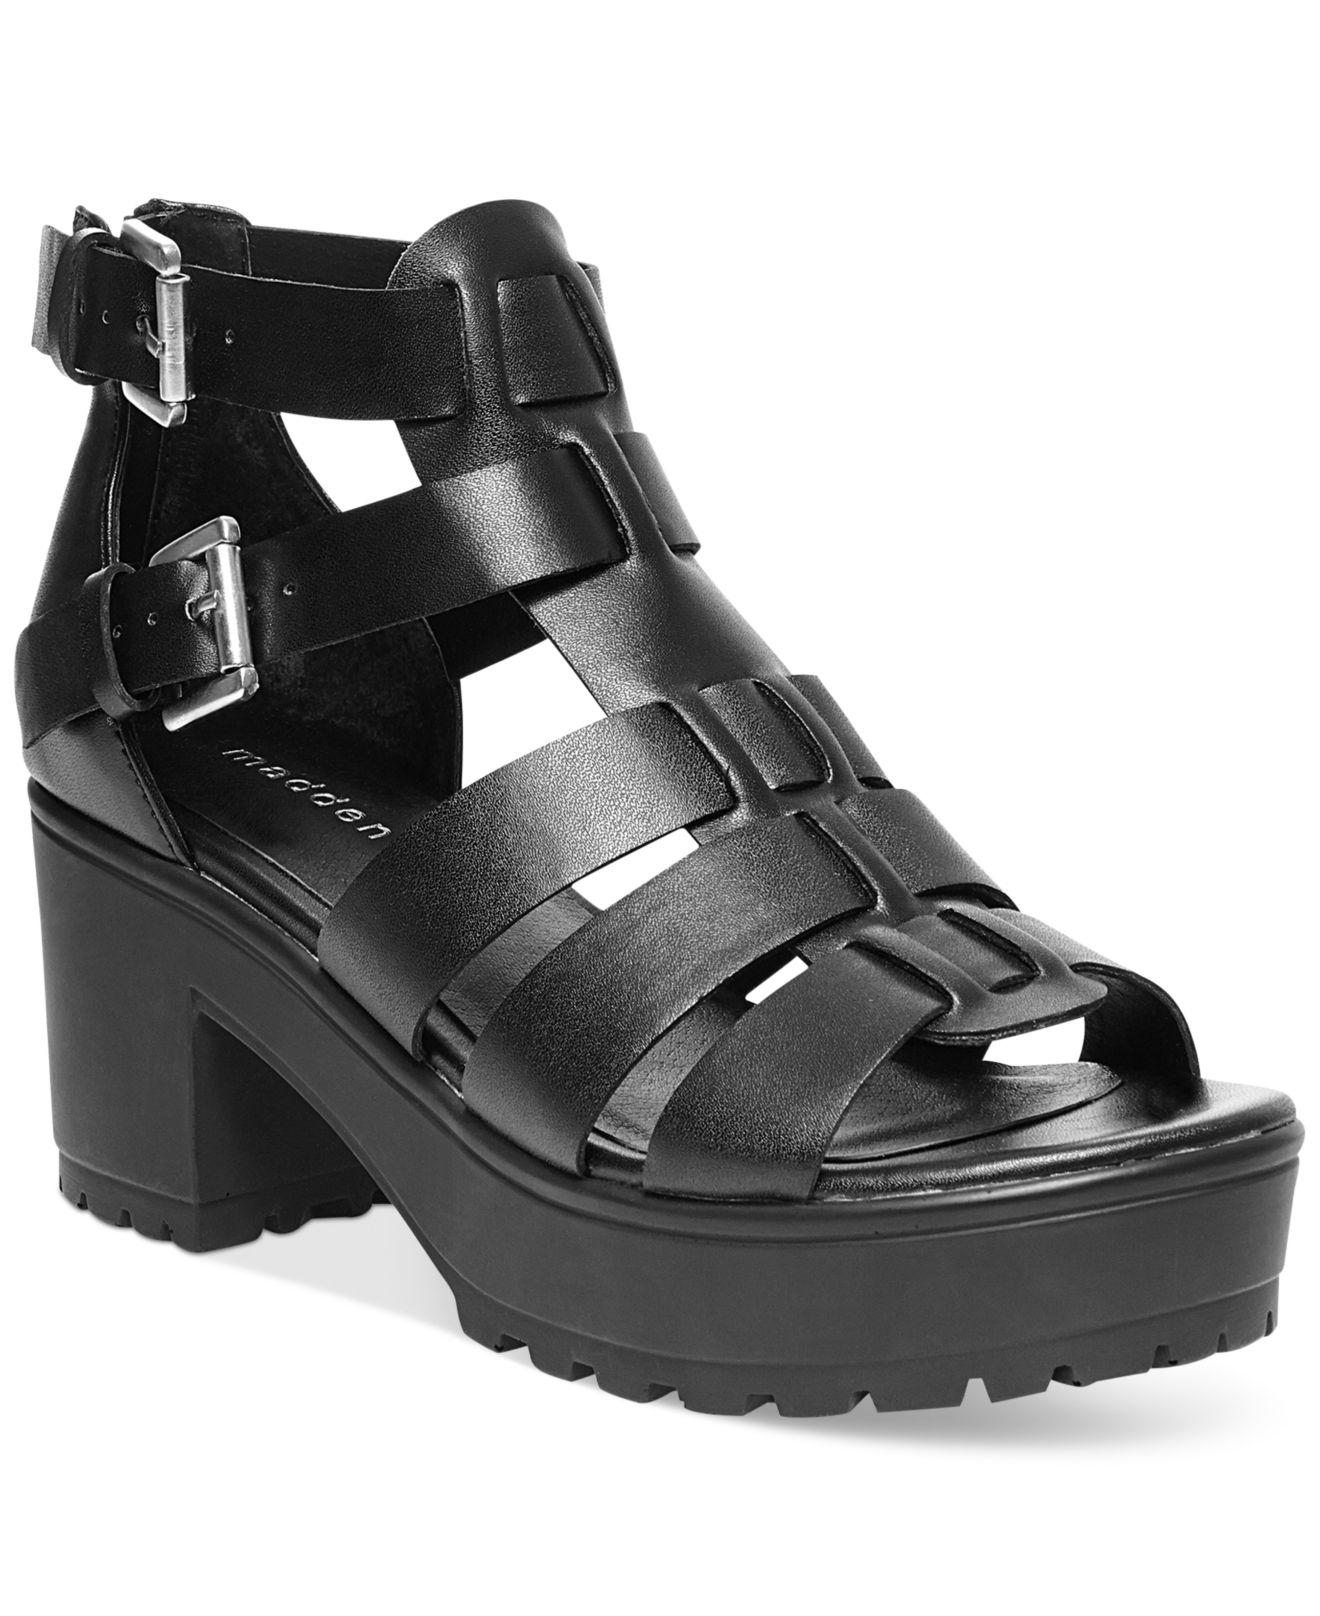 Madden Girl Daizyy Platform Lug Sandals In Black Lyst